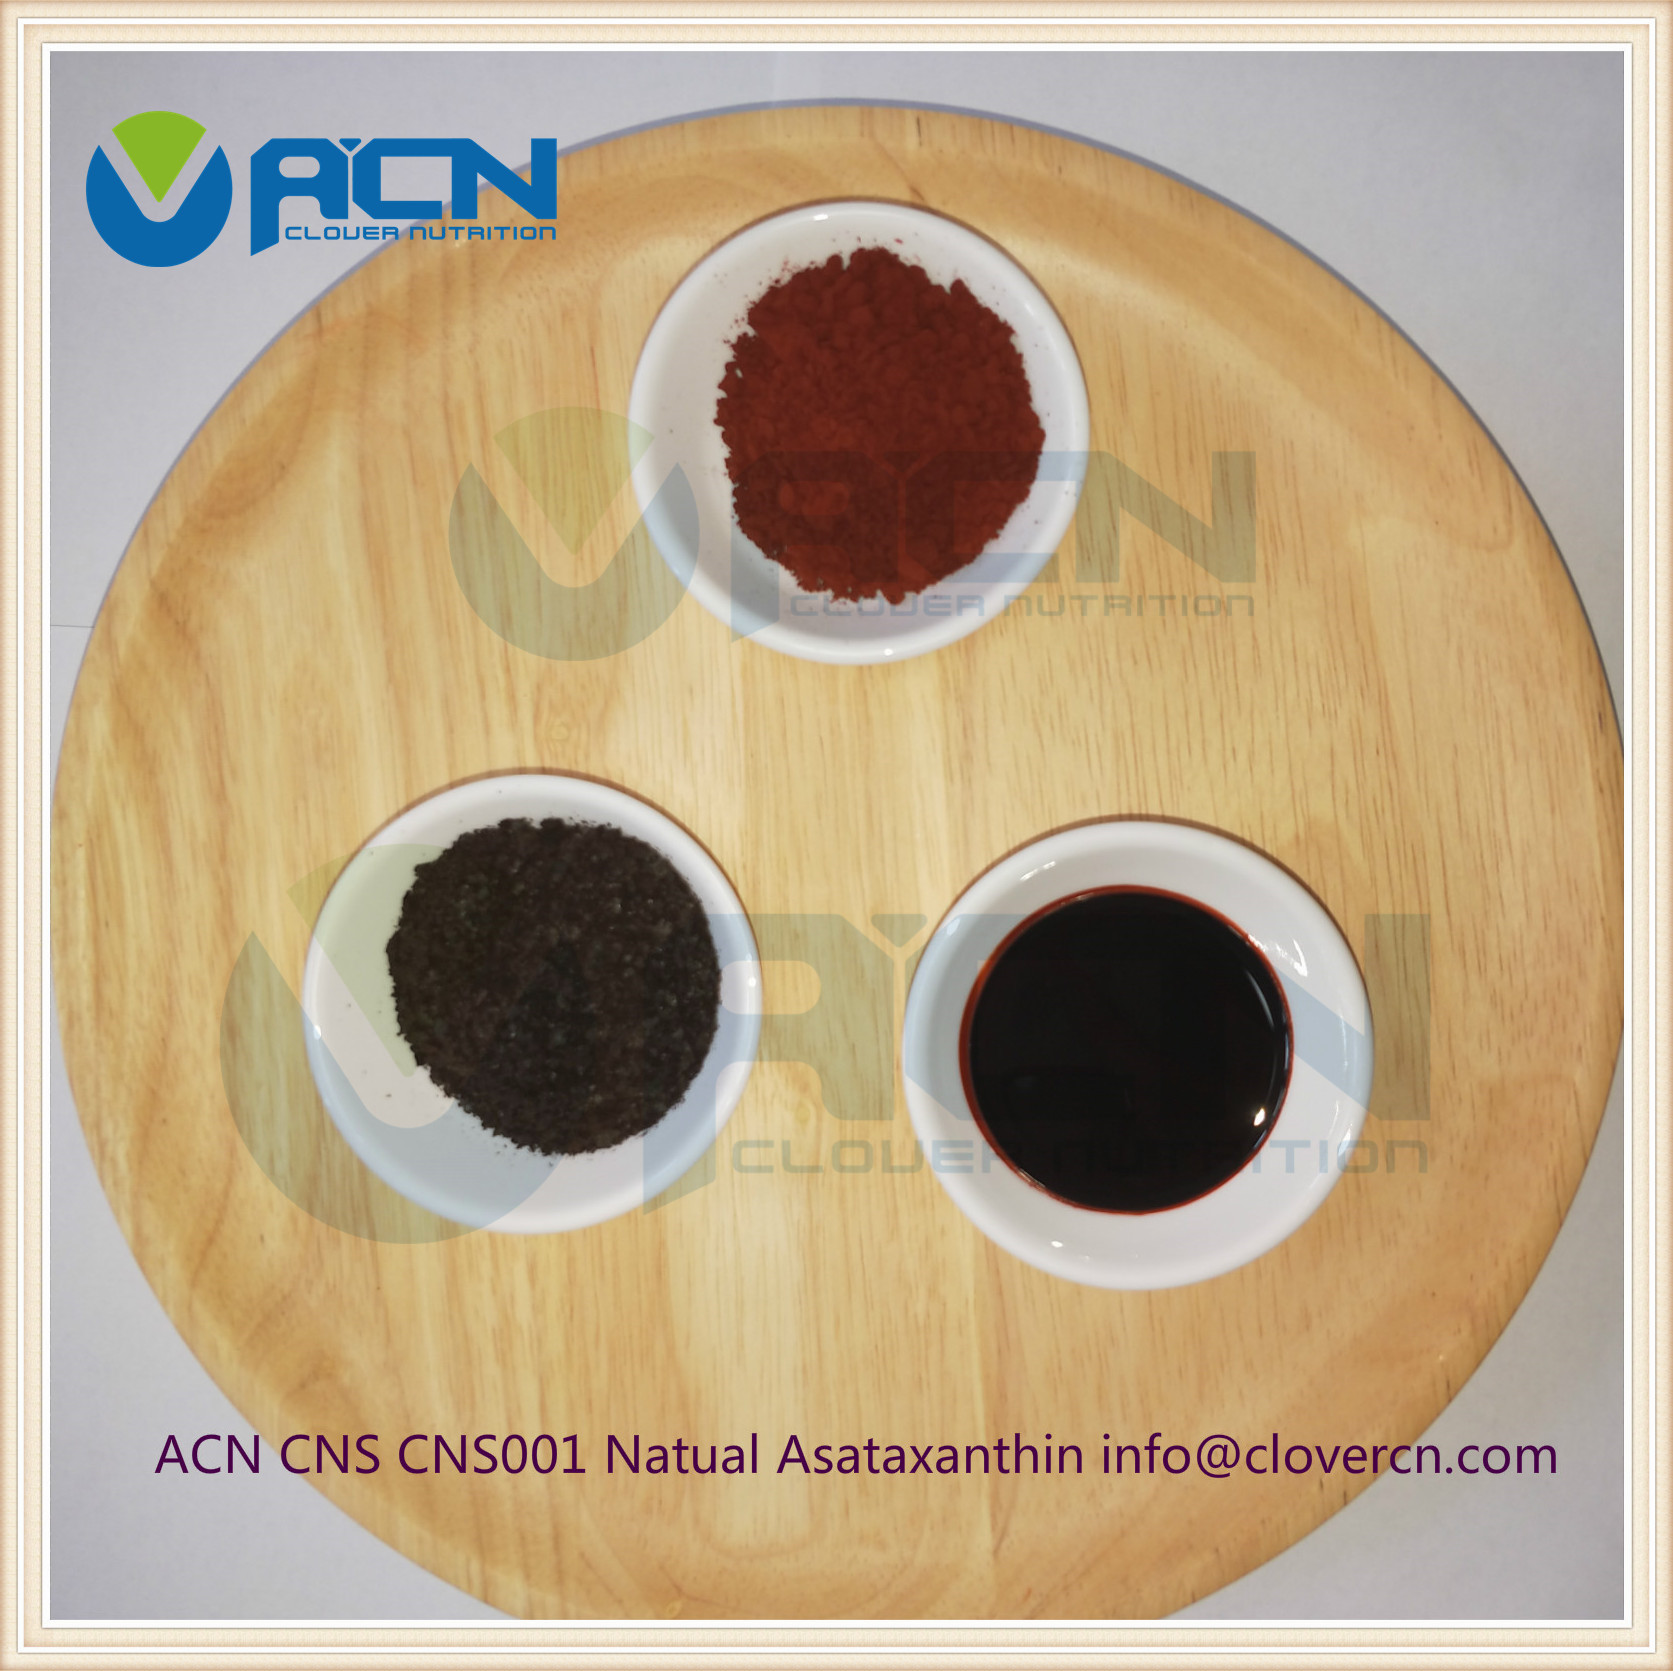 ACN CNS001 Natual Asataxanthin info_clovercn.com